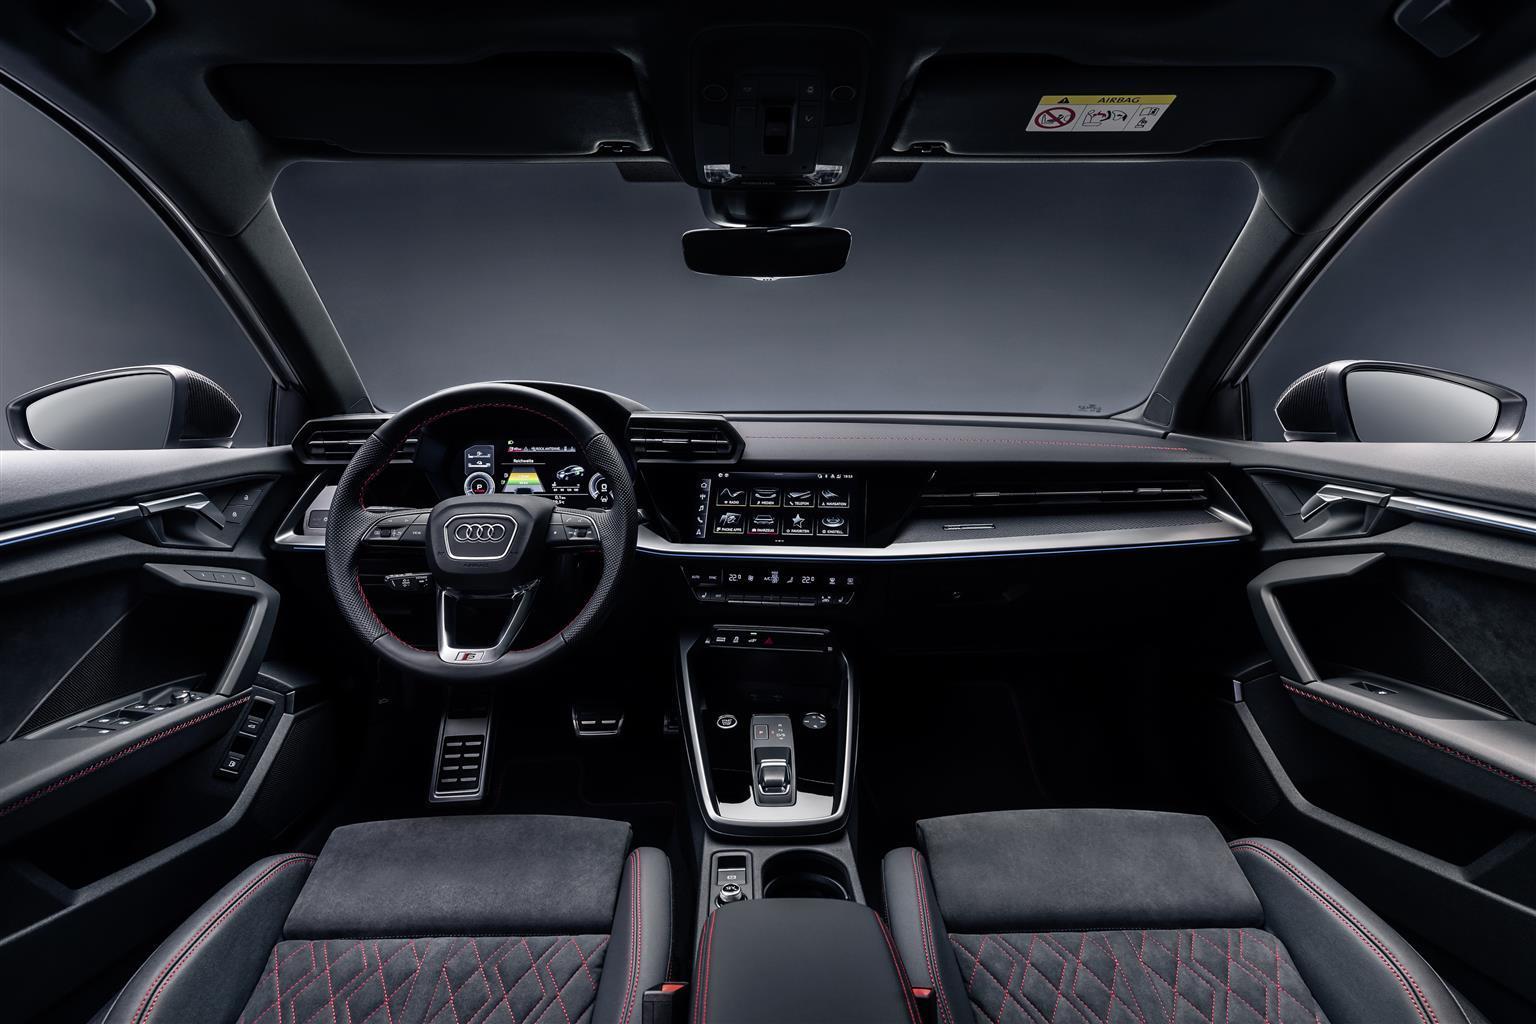 Audi A3 - 21 12 2020